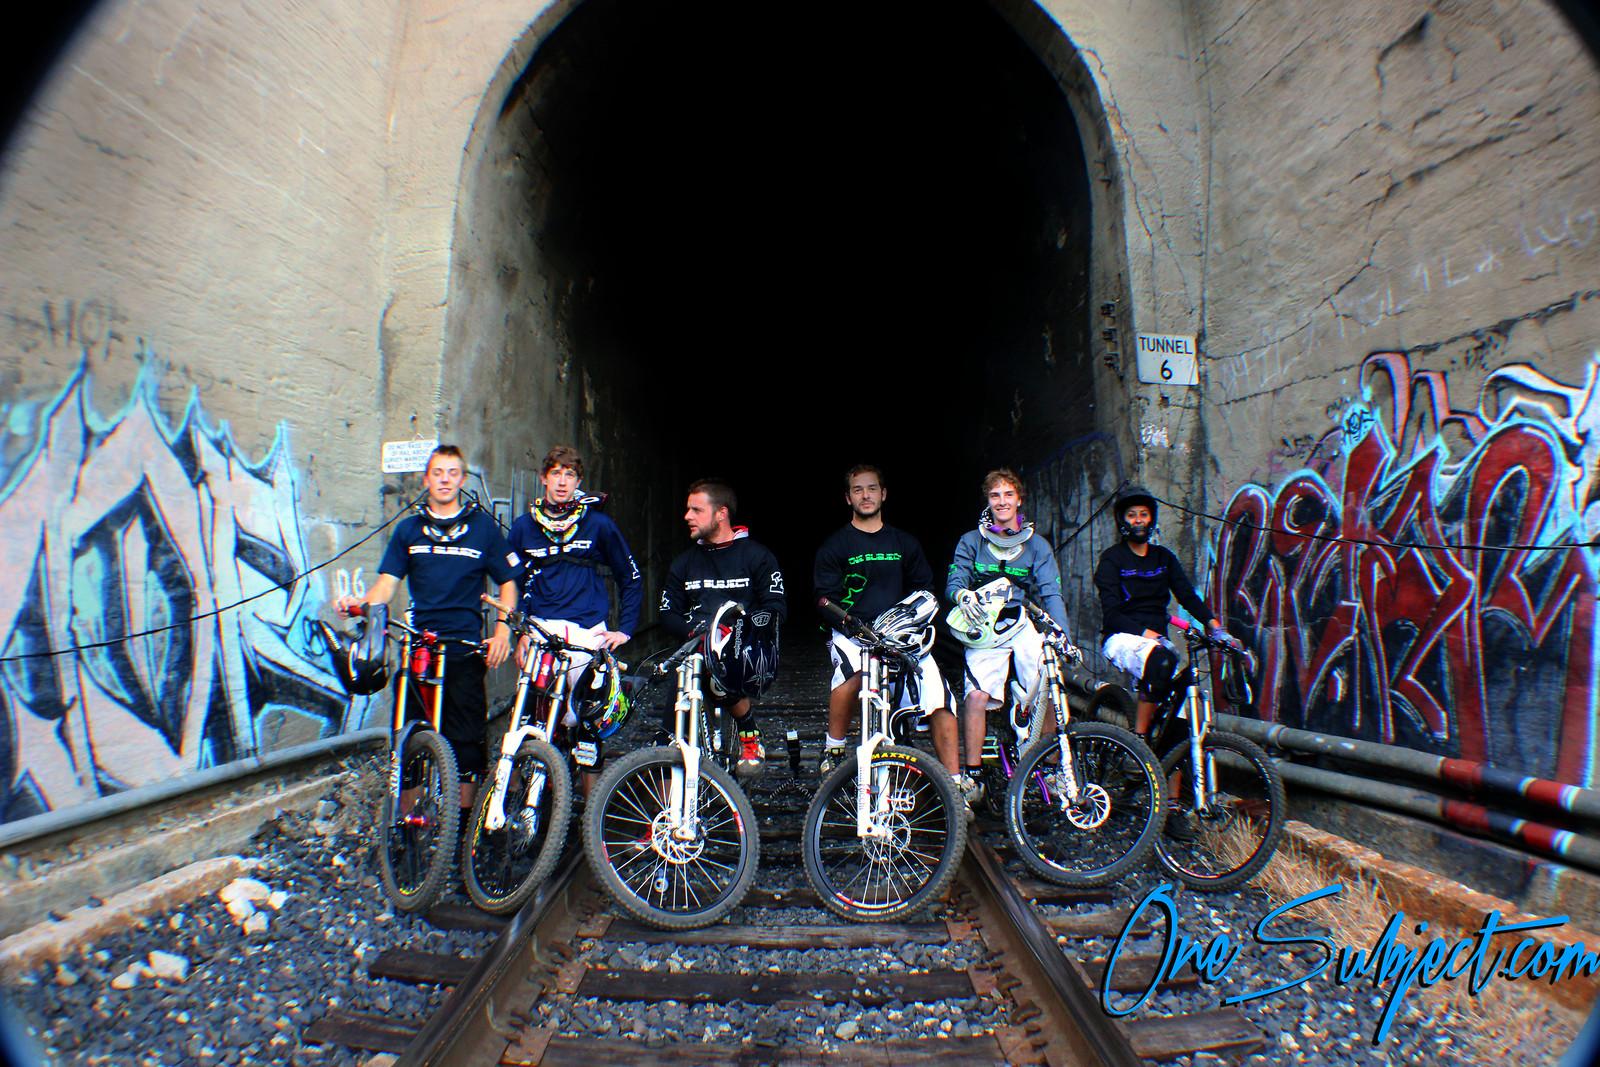 IMG 2210 - GnarHuck - Mountain Biking Pictures - Vital MTB